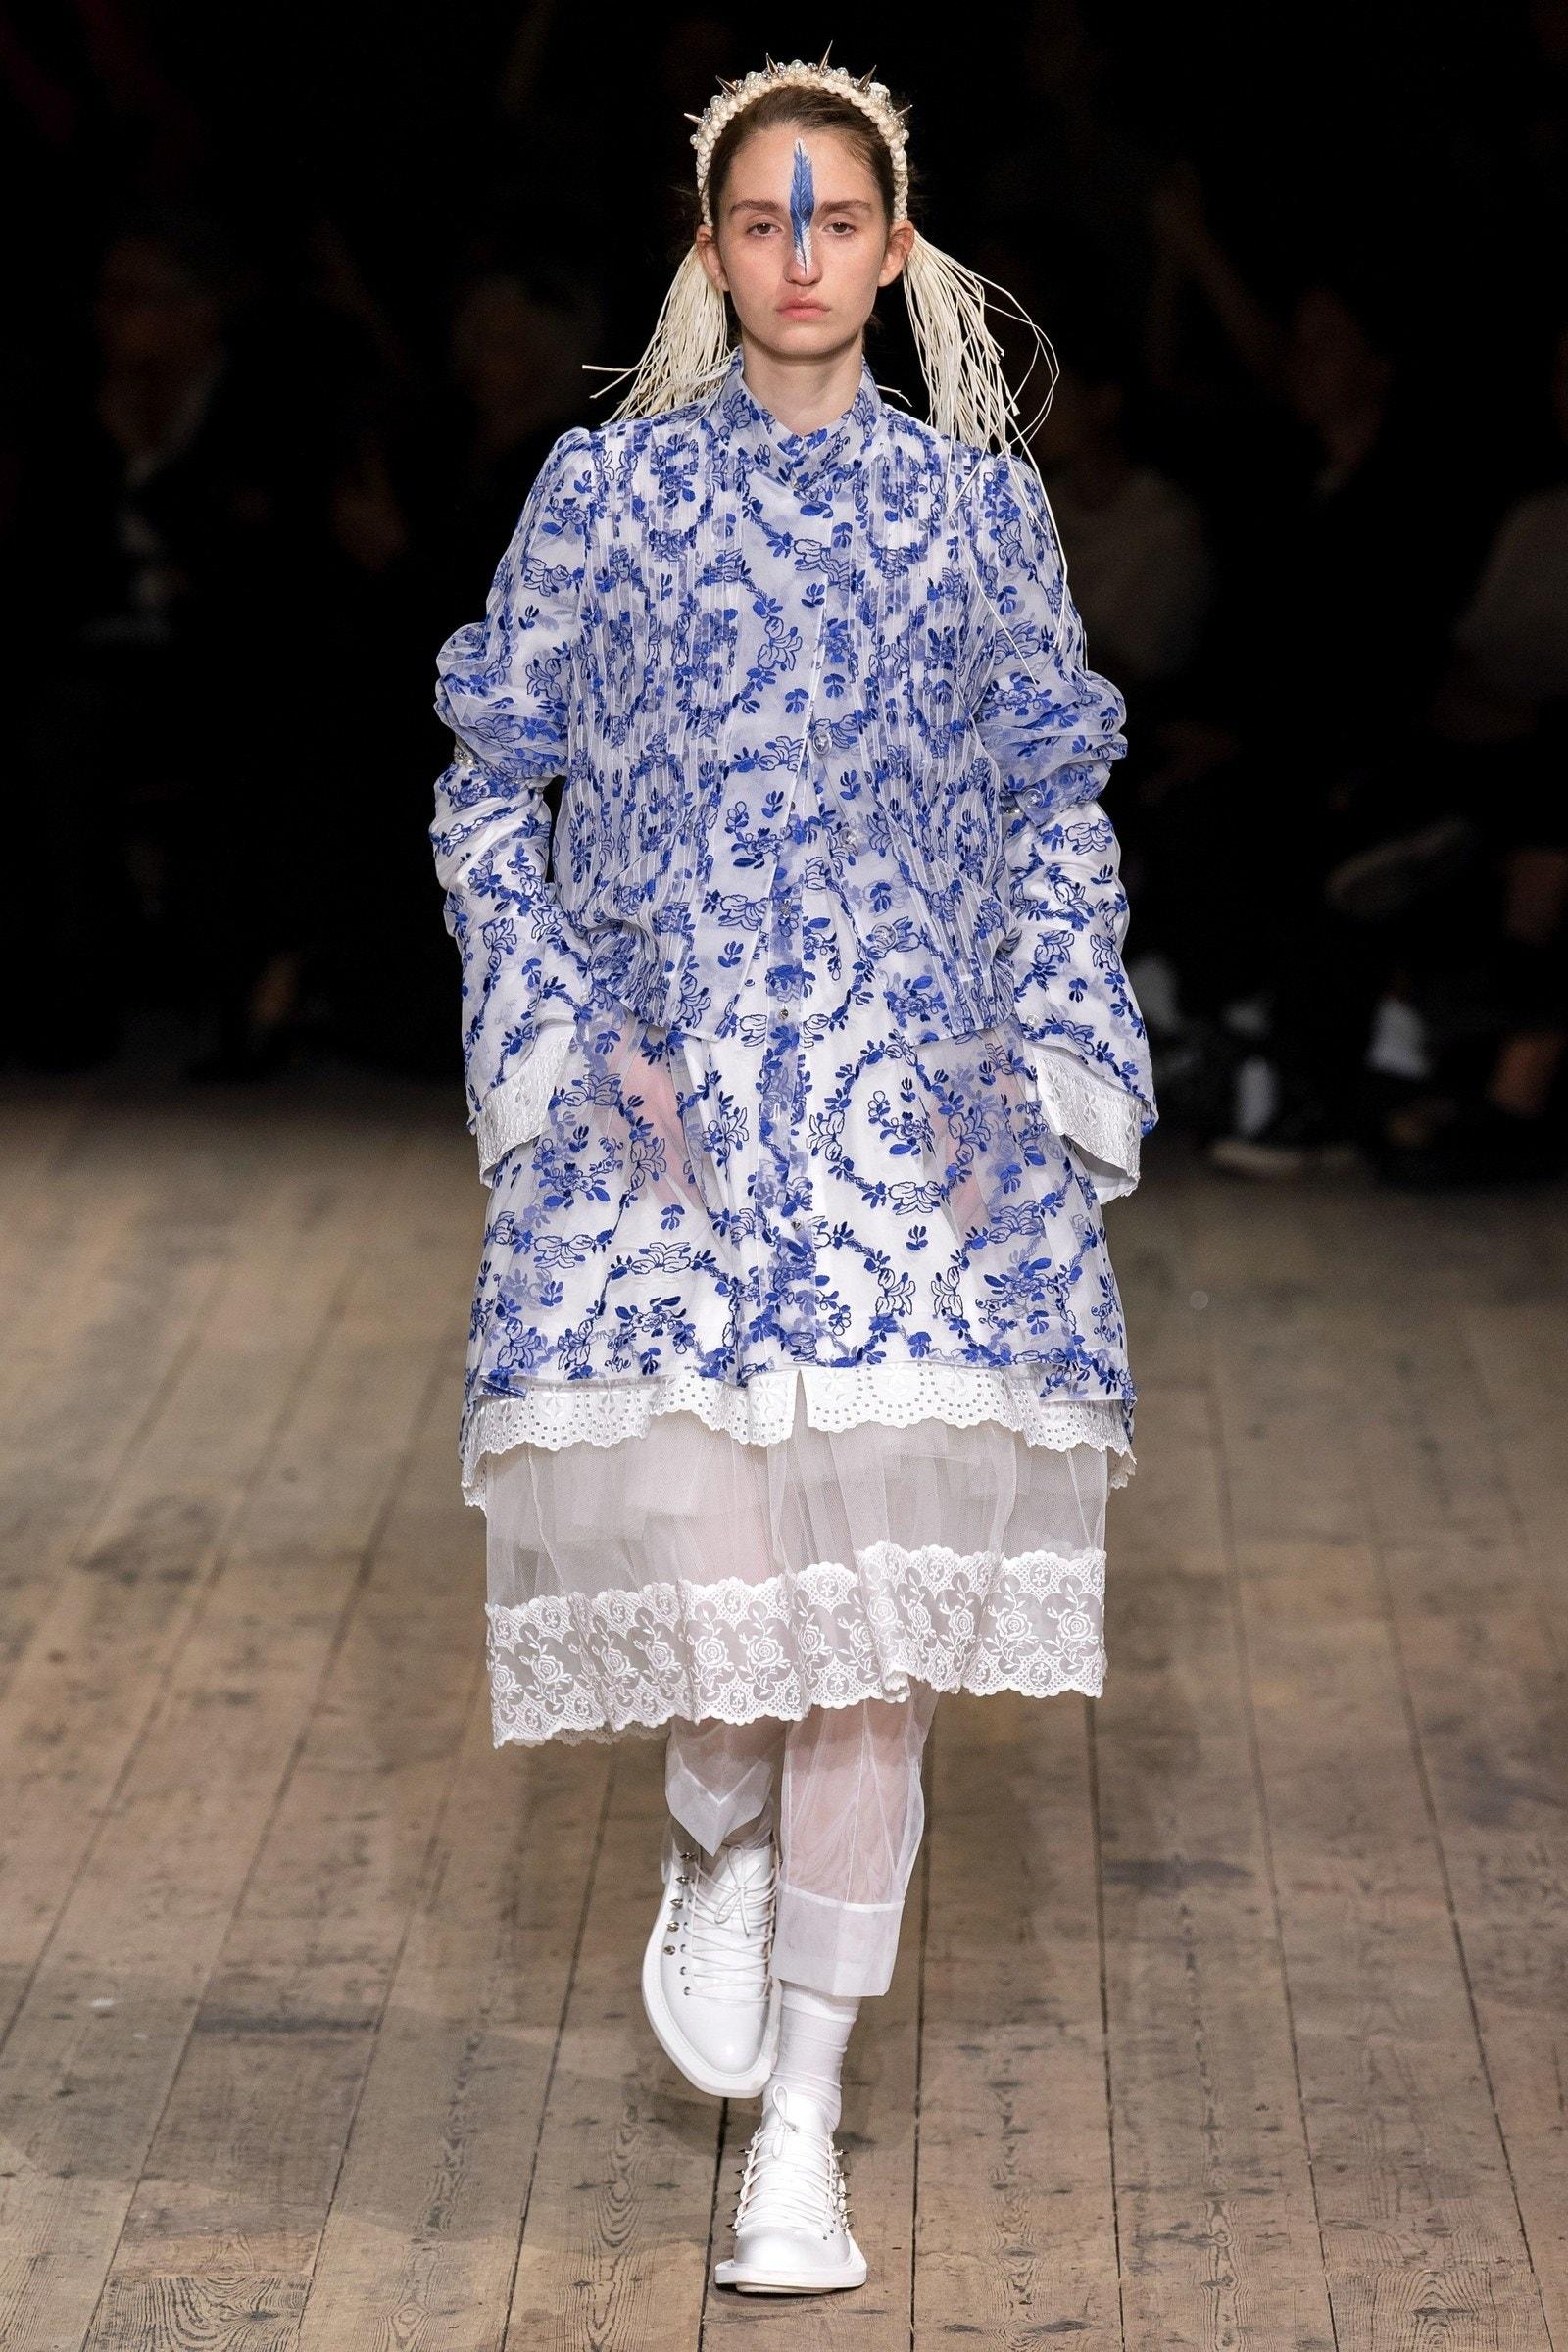 Đầm hoa nhỏ classic blue của Simone Rocha